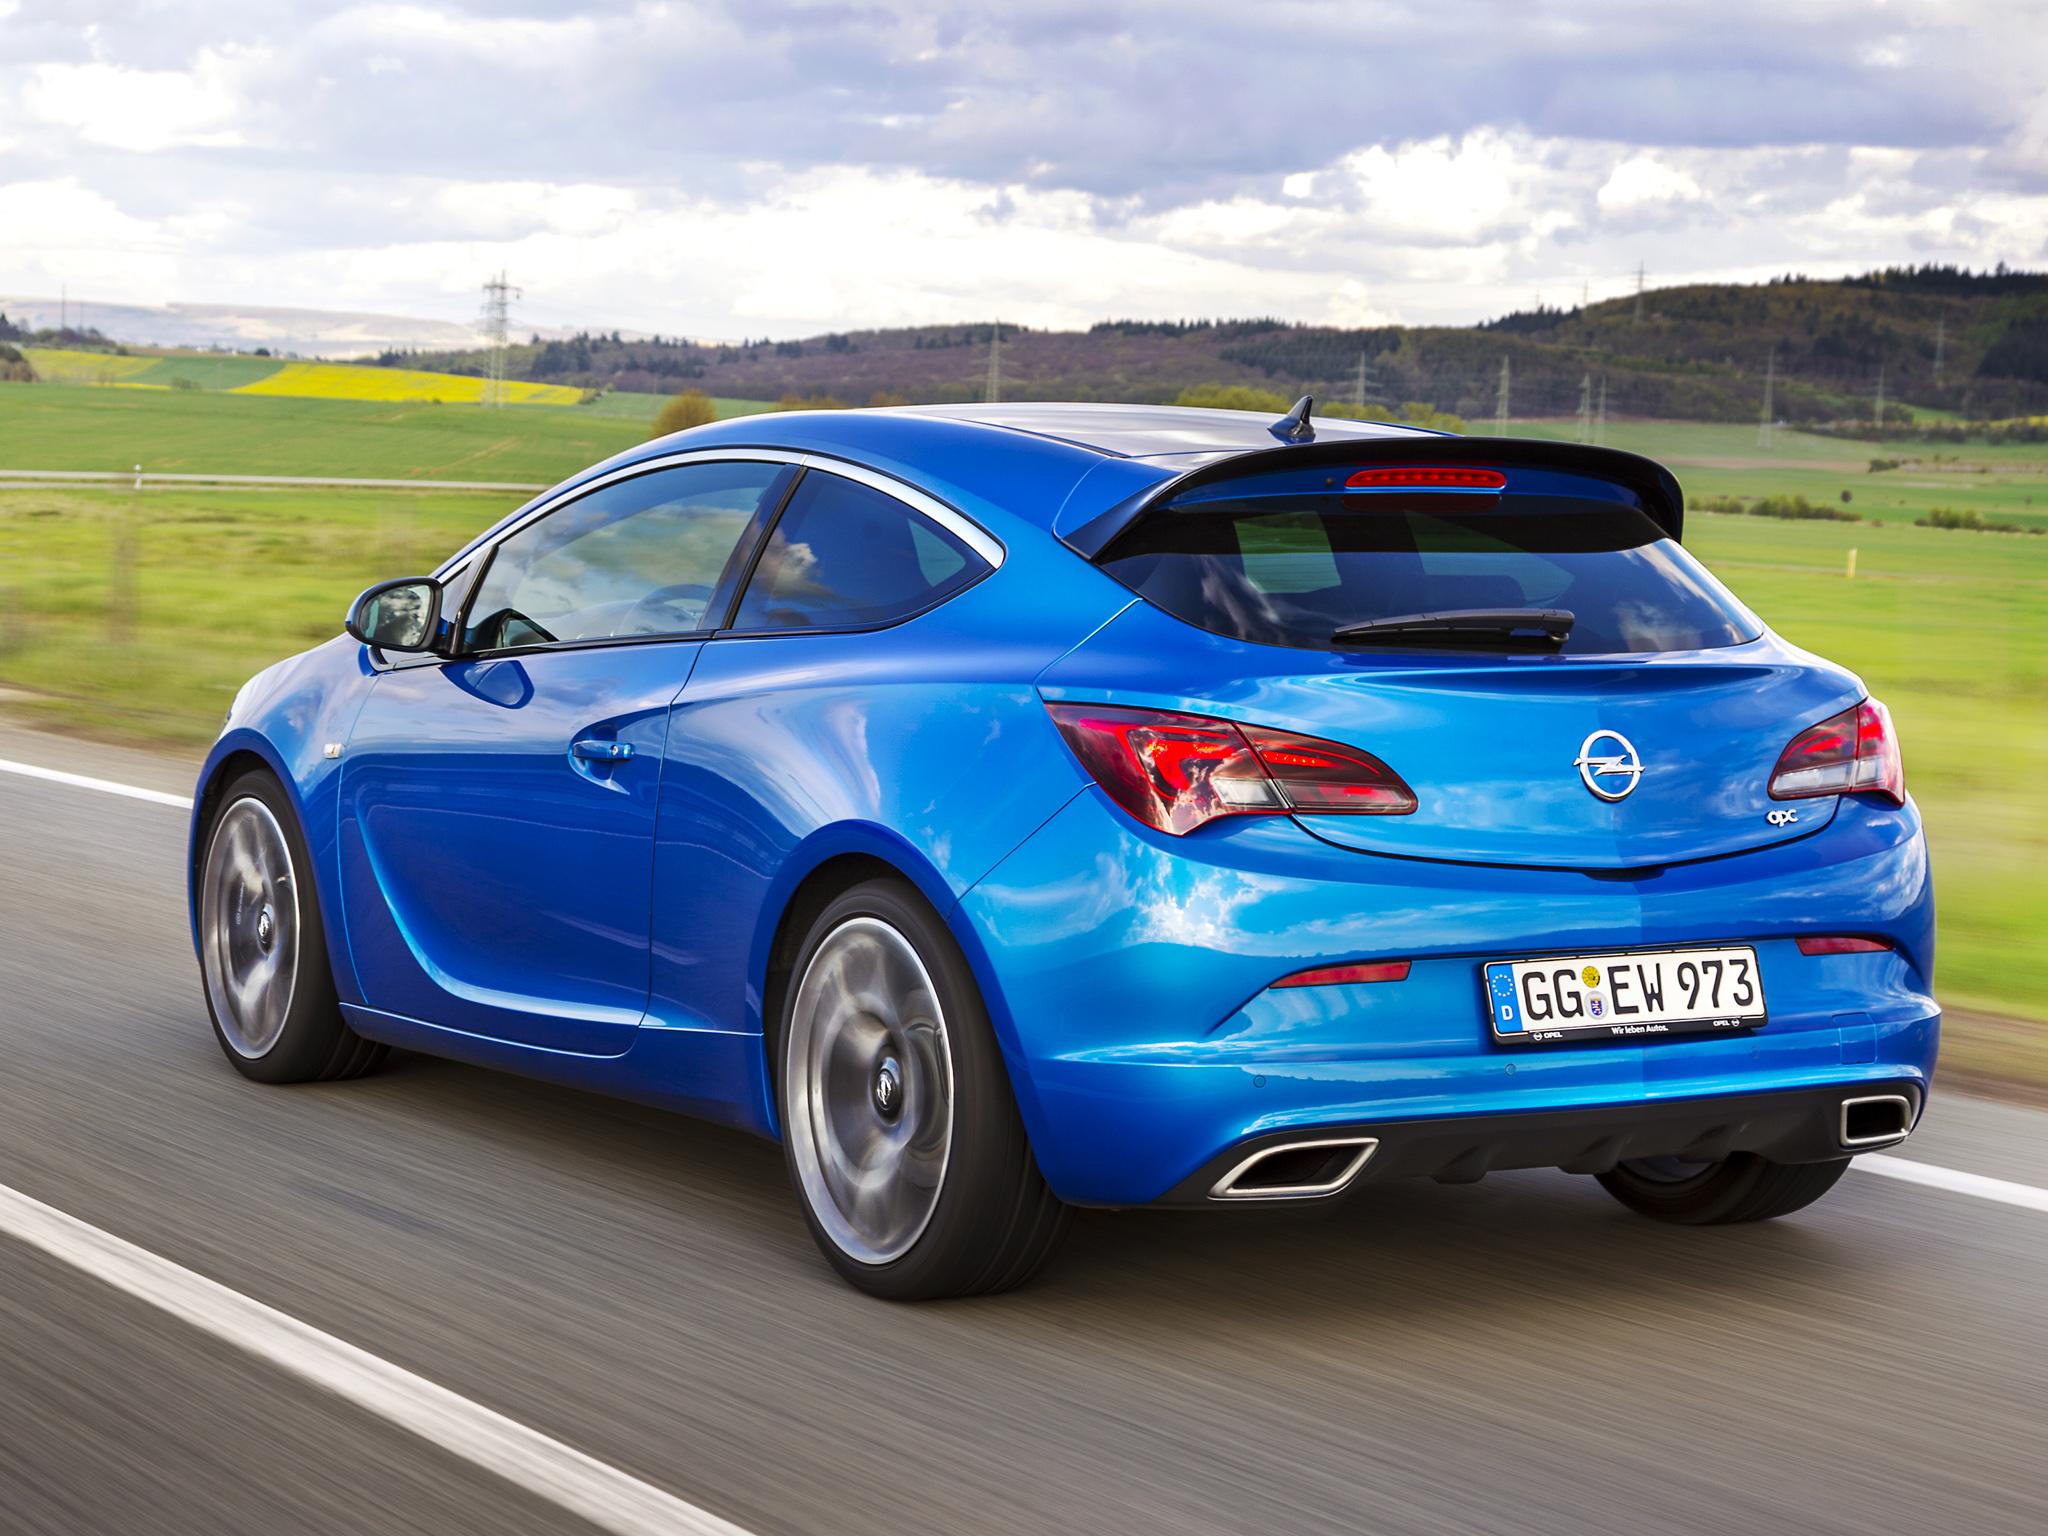 Nuevo Astra opc Opel_astra_opc_j_hatchback3d-3522